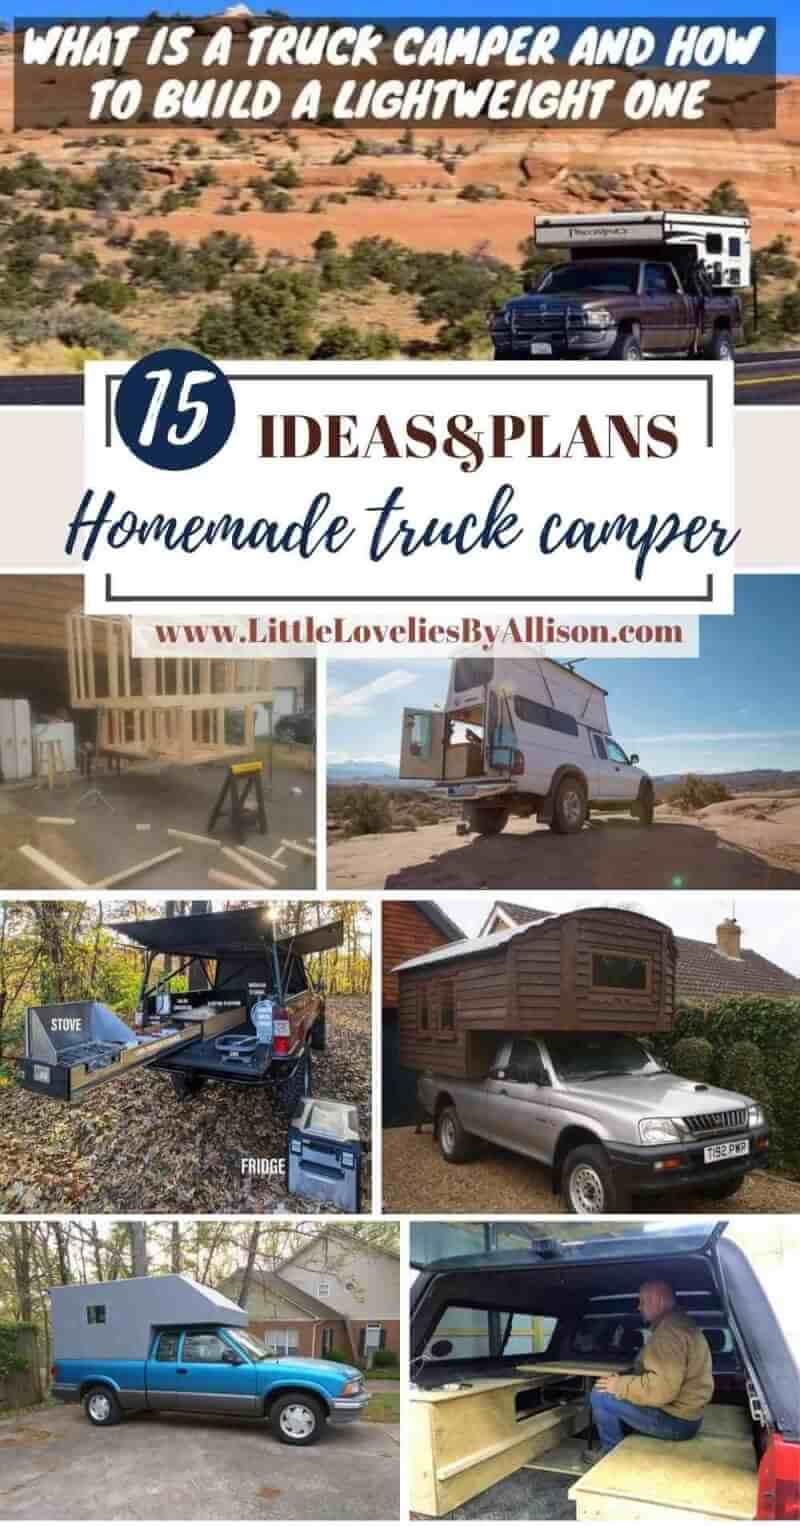 Best Homemade truck camper